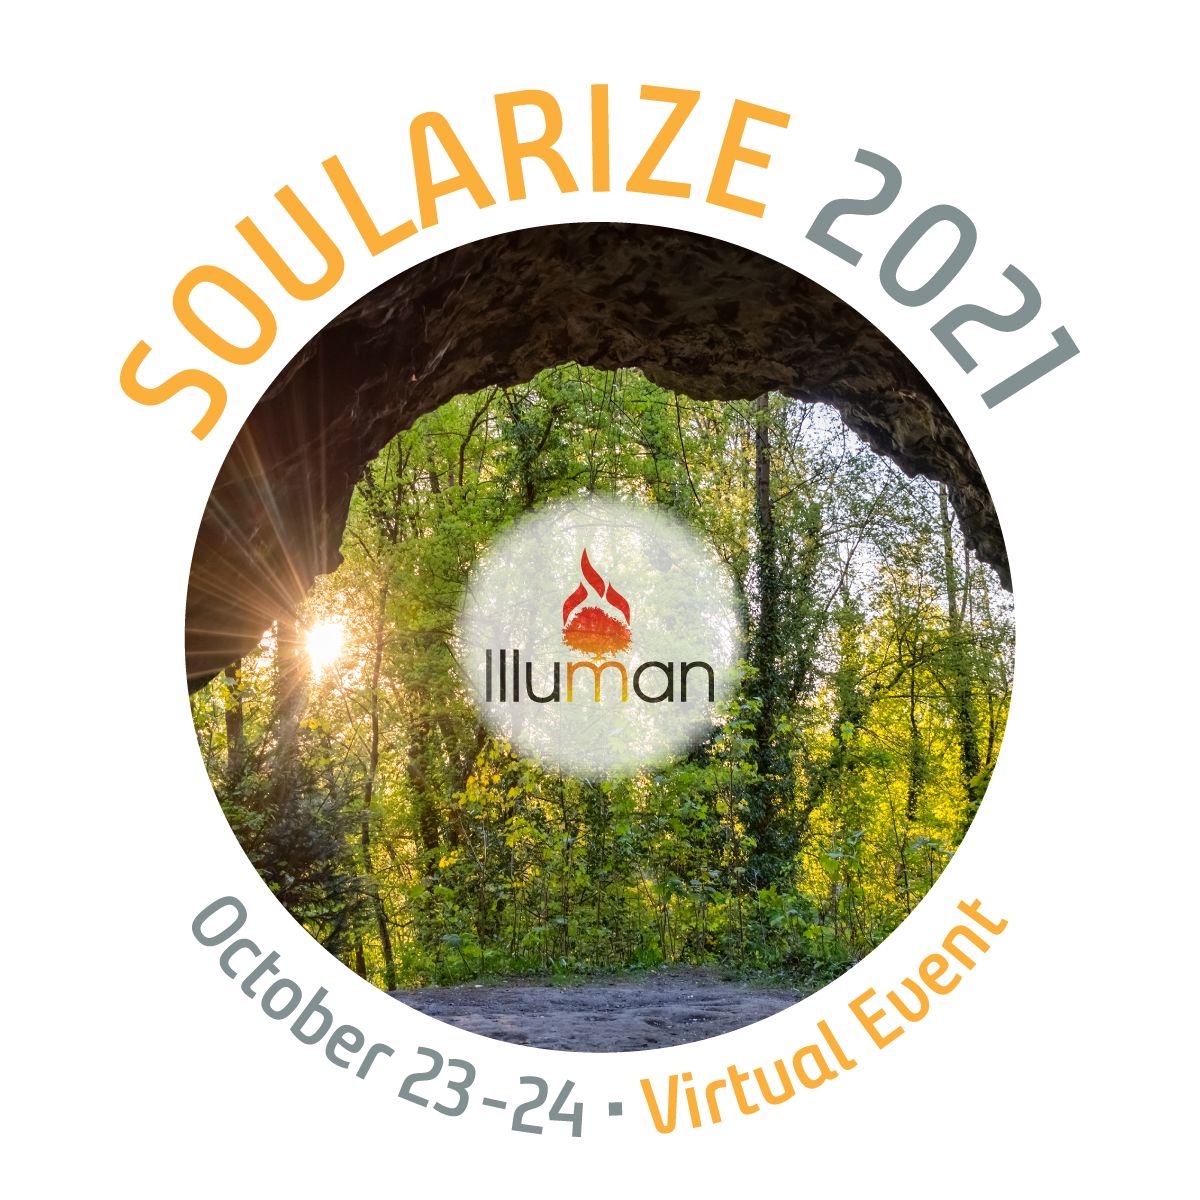 Soularize 2021